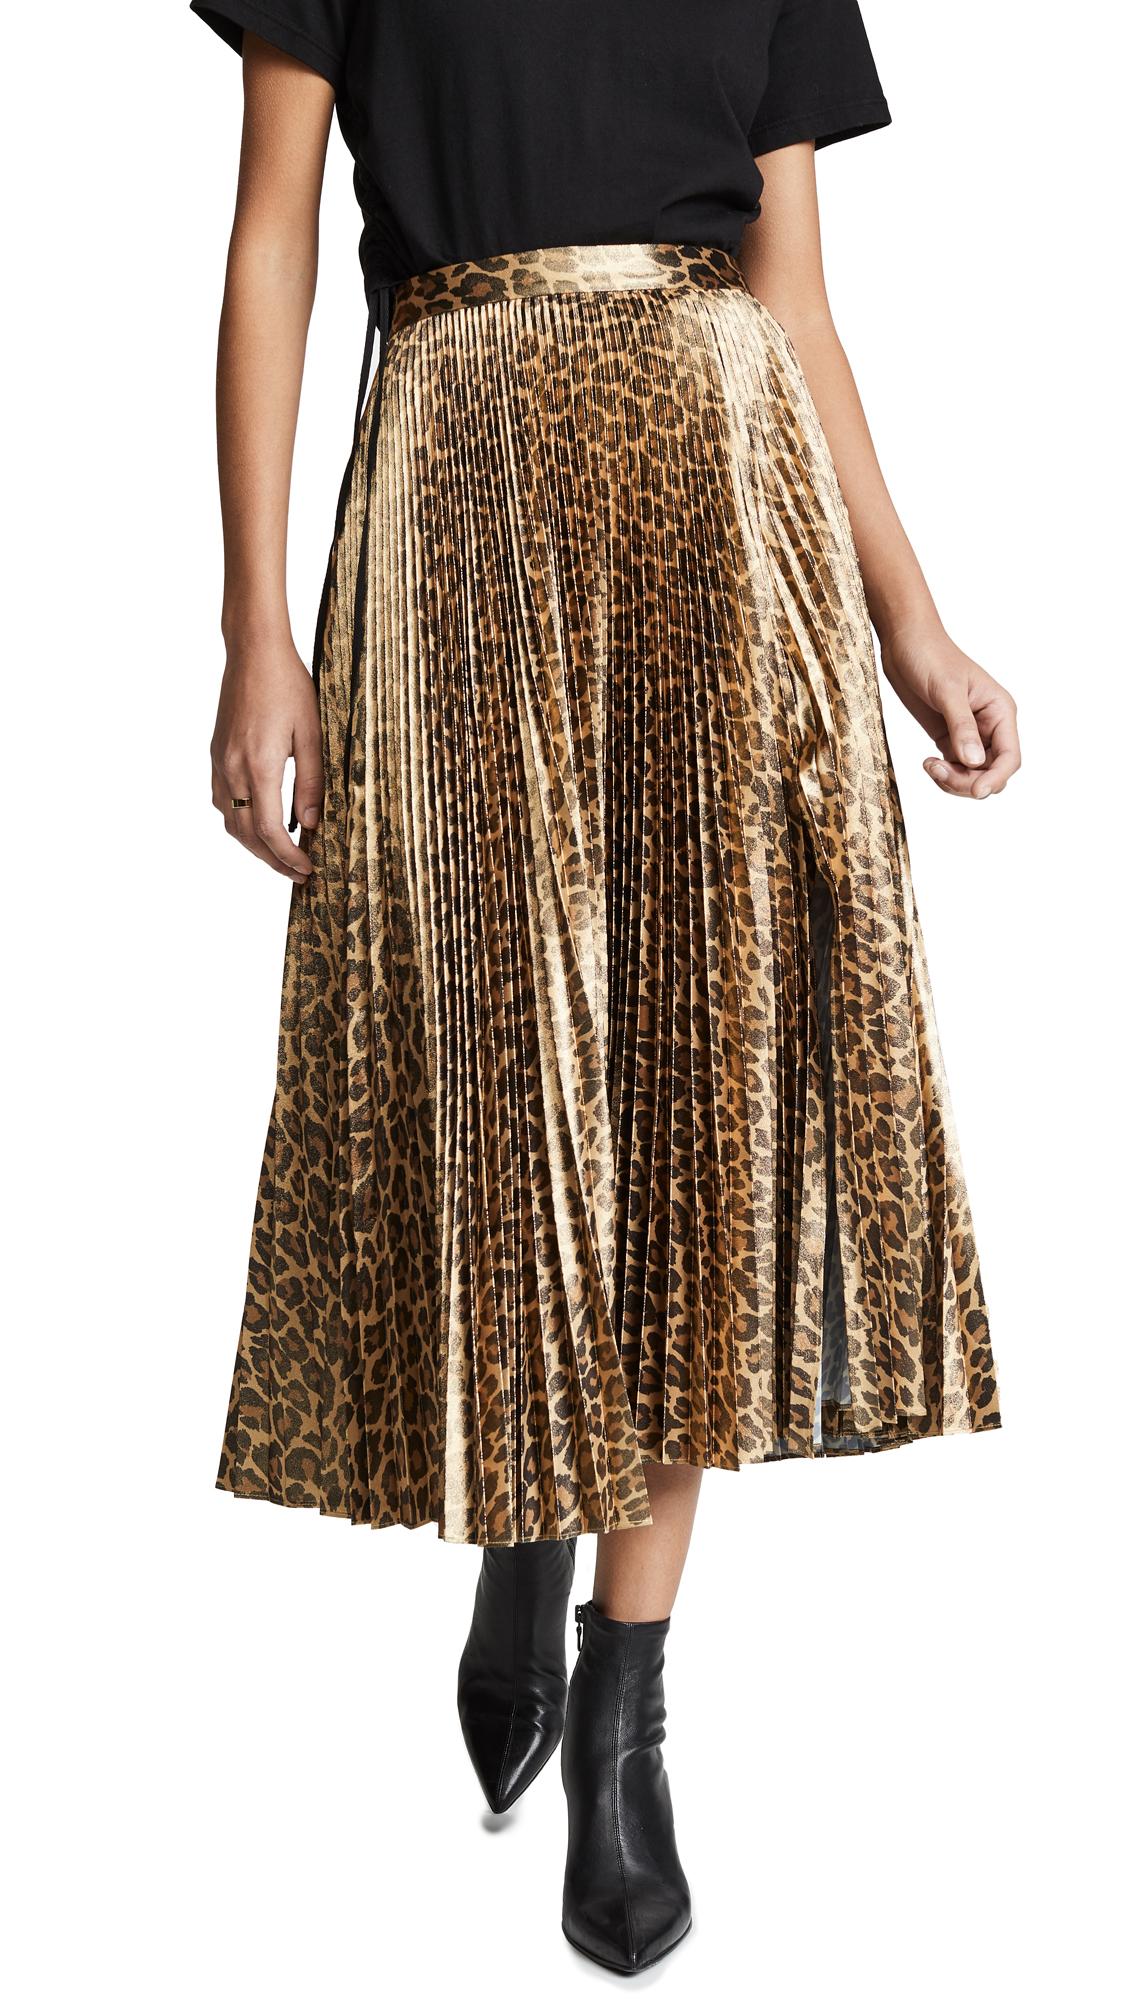 Bobby Leopard-Print Pleated Midi Skirt in Metallic Gold